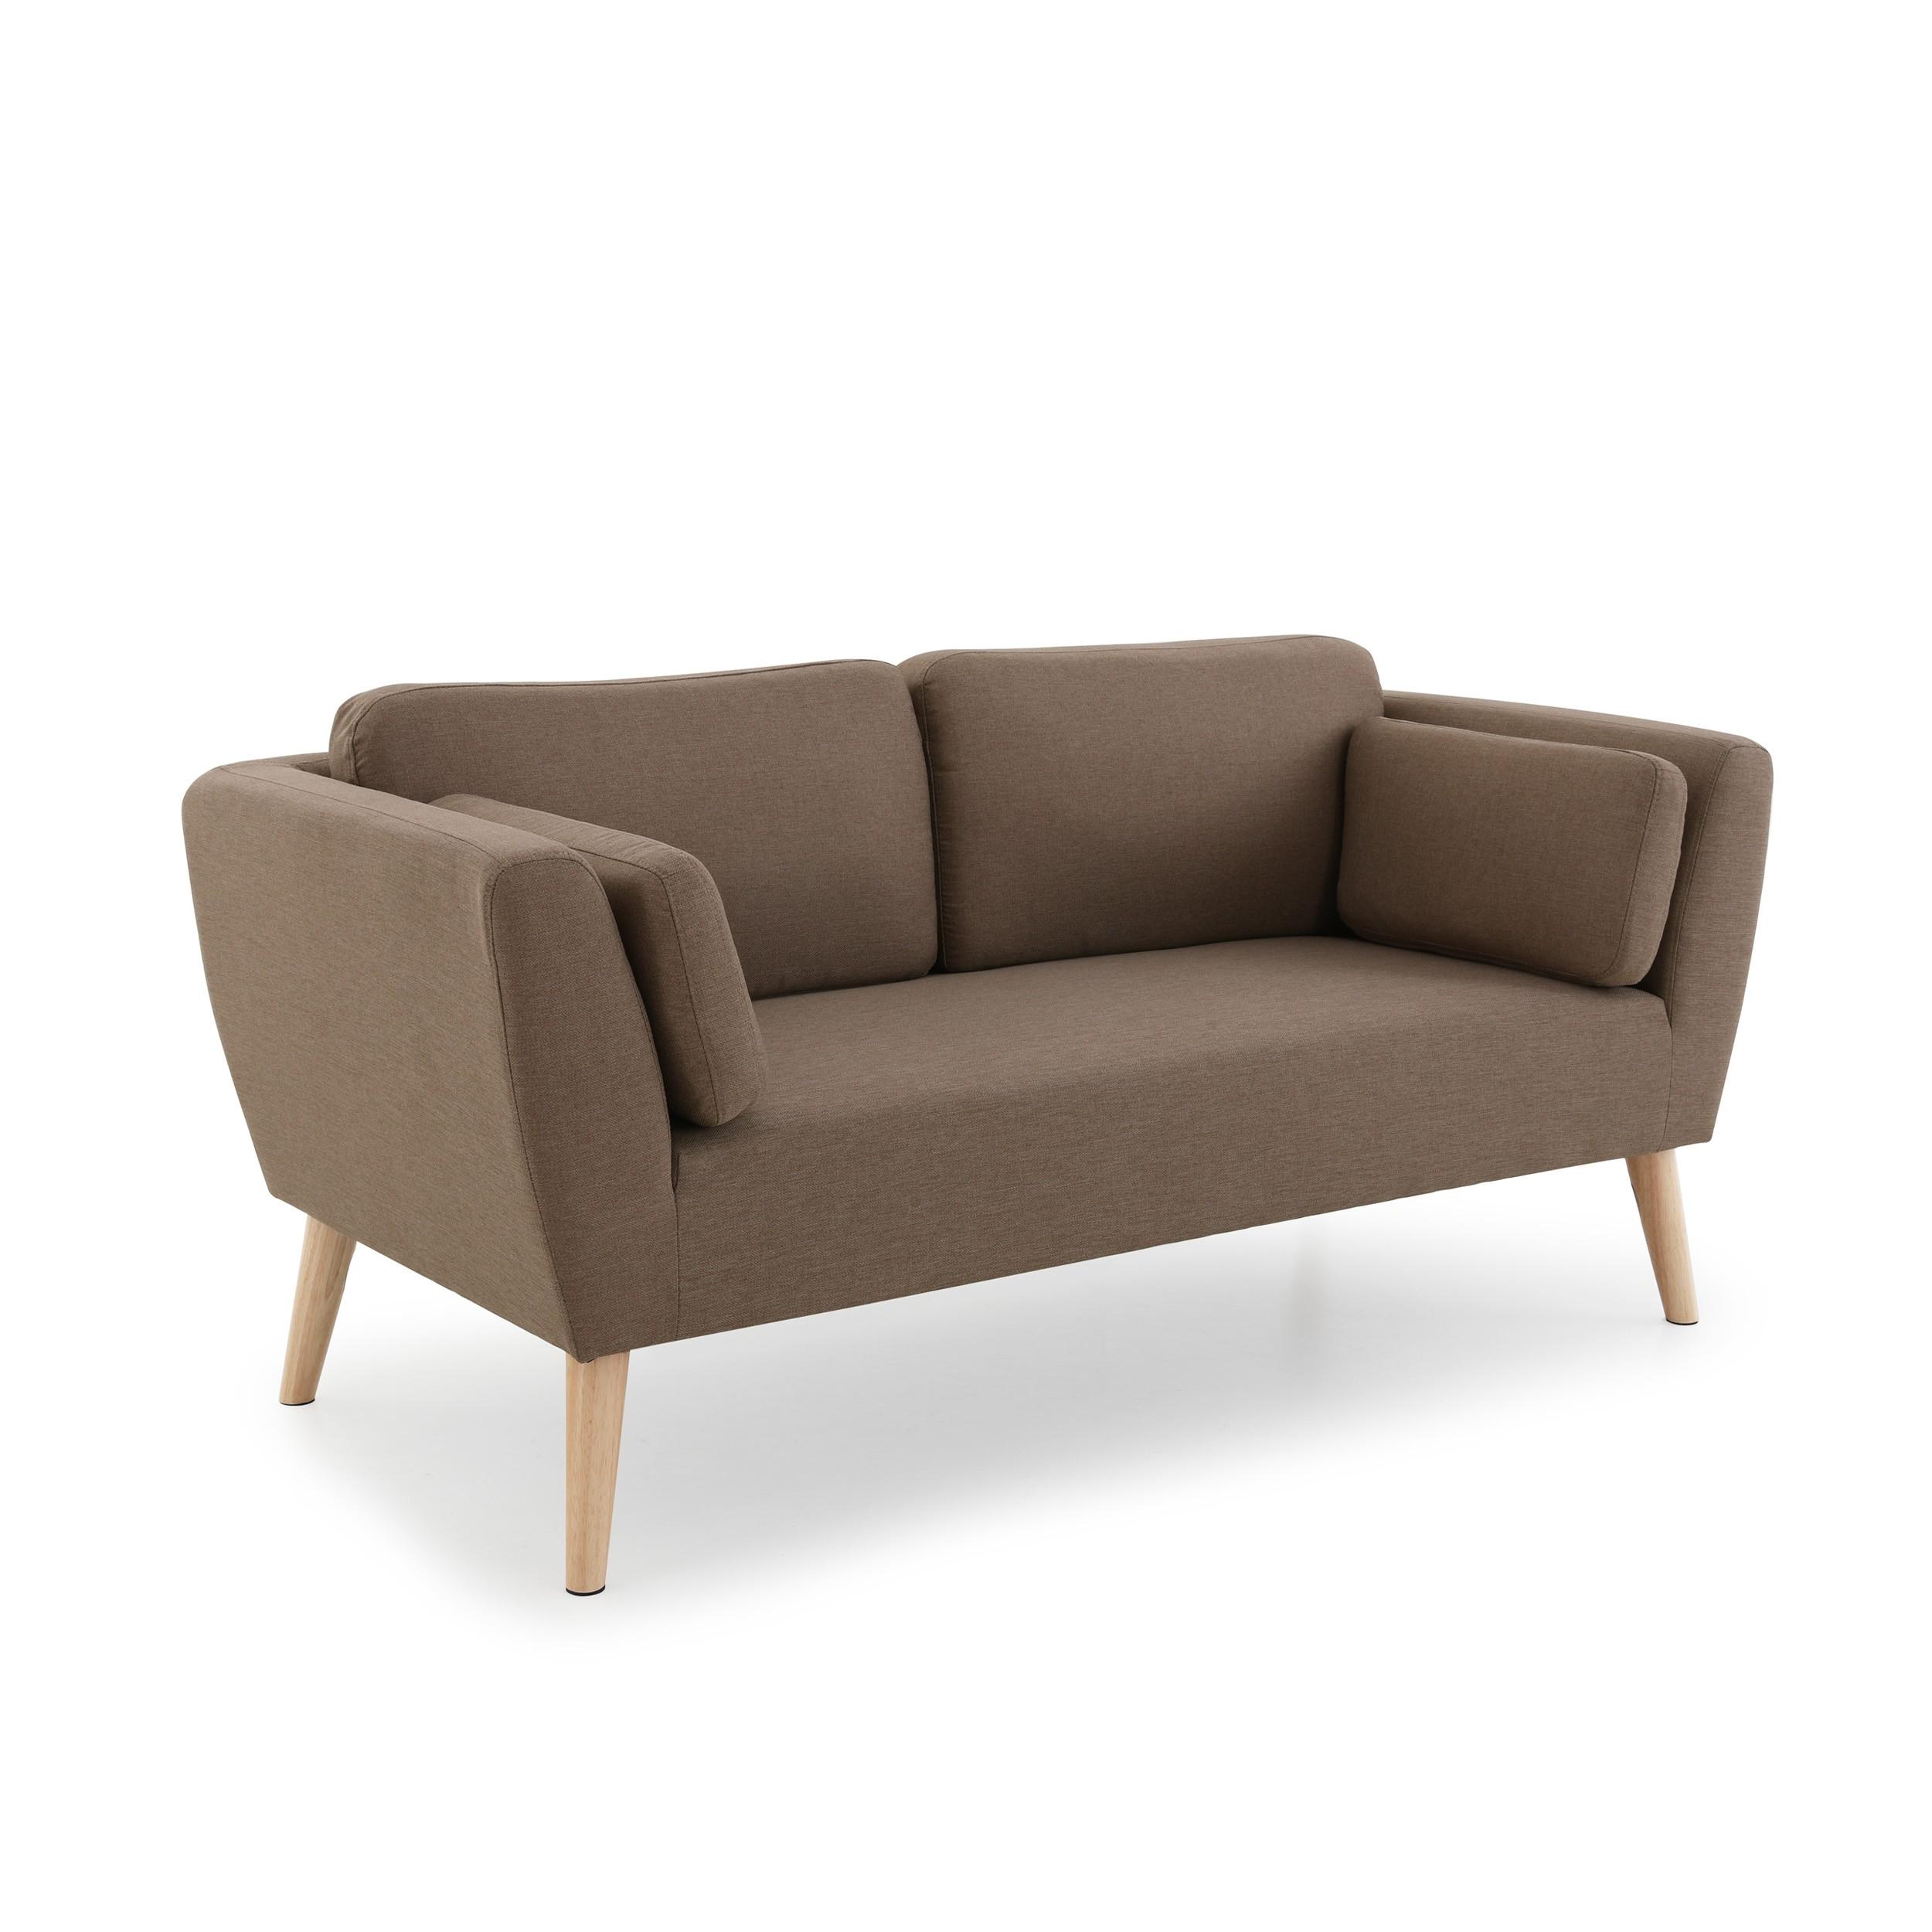 Full Size of Esszimmer Sofa Couch Vintage Leder Ikea Sofabank 3 Sitzer Samt Grau Modern Landhausstil Mc Haus Evy Salon Bro Stoff 2 Sitze Braun 160x80x76cm Boxspring Sofa Esszimmer Sofa